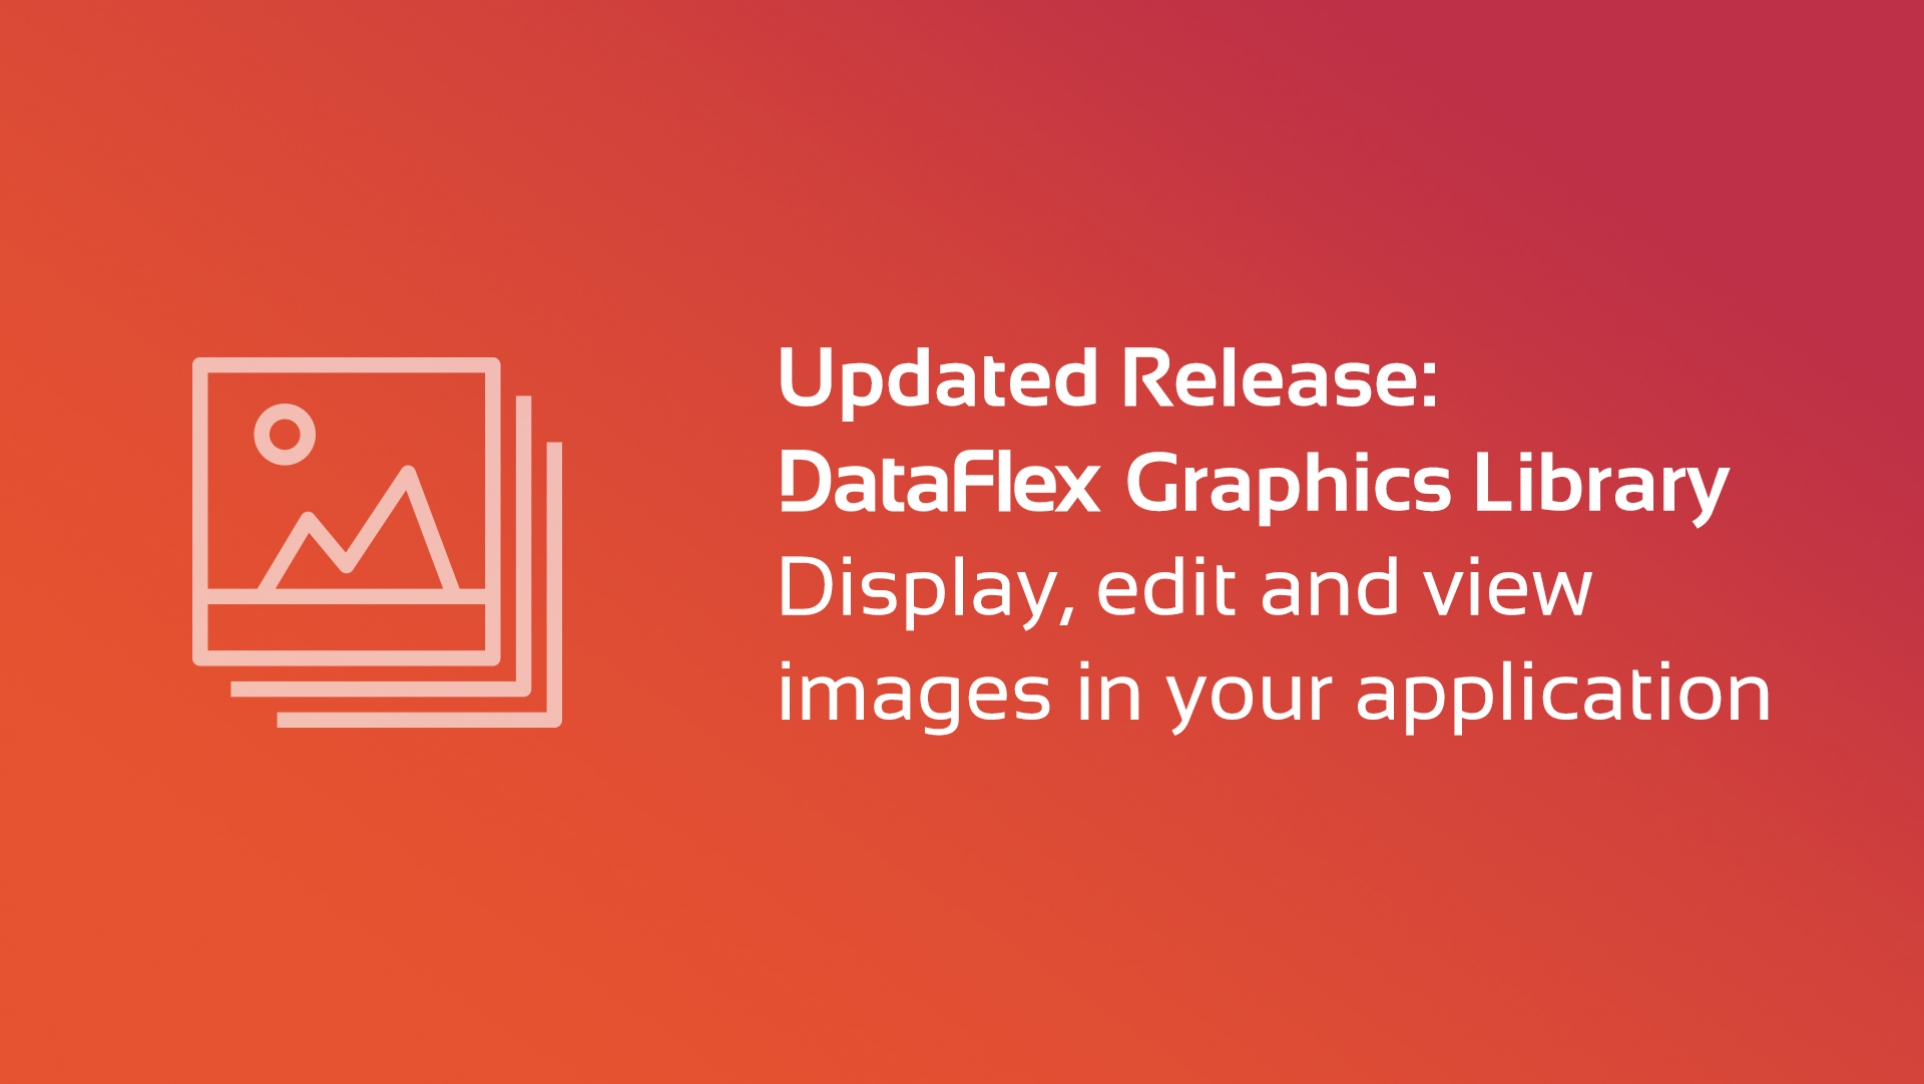 DataFlex Graphics Library